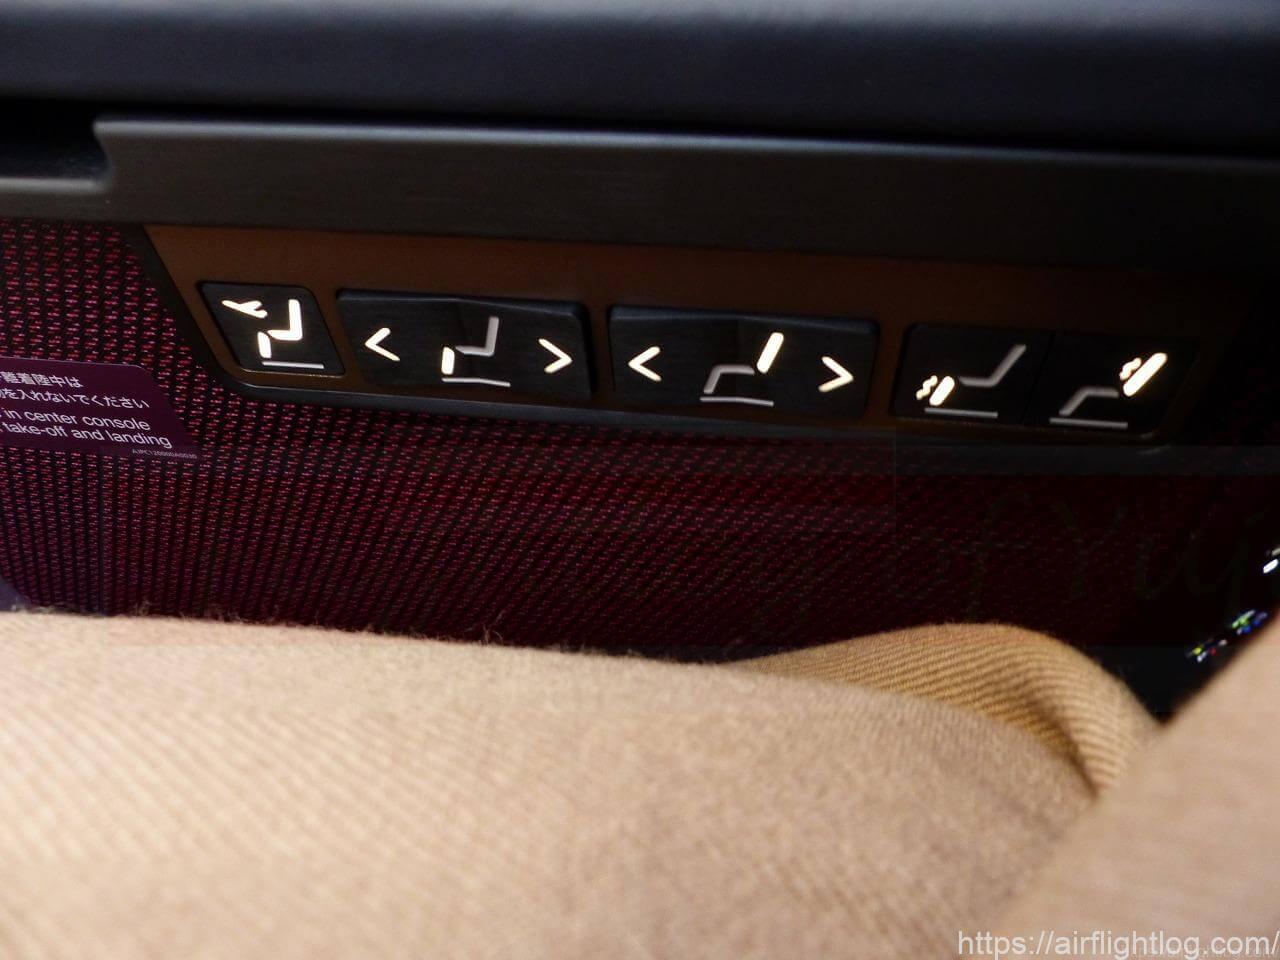 JALA350-900ファーストクラスシート電動スイッチ